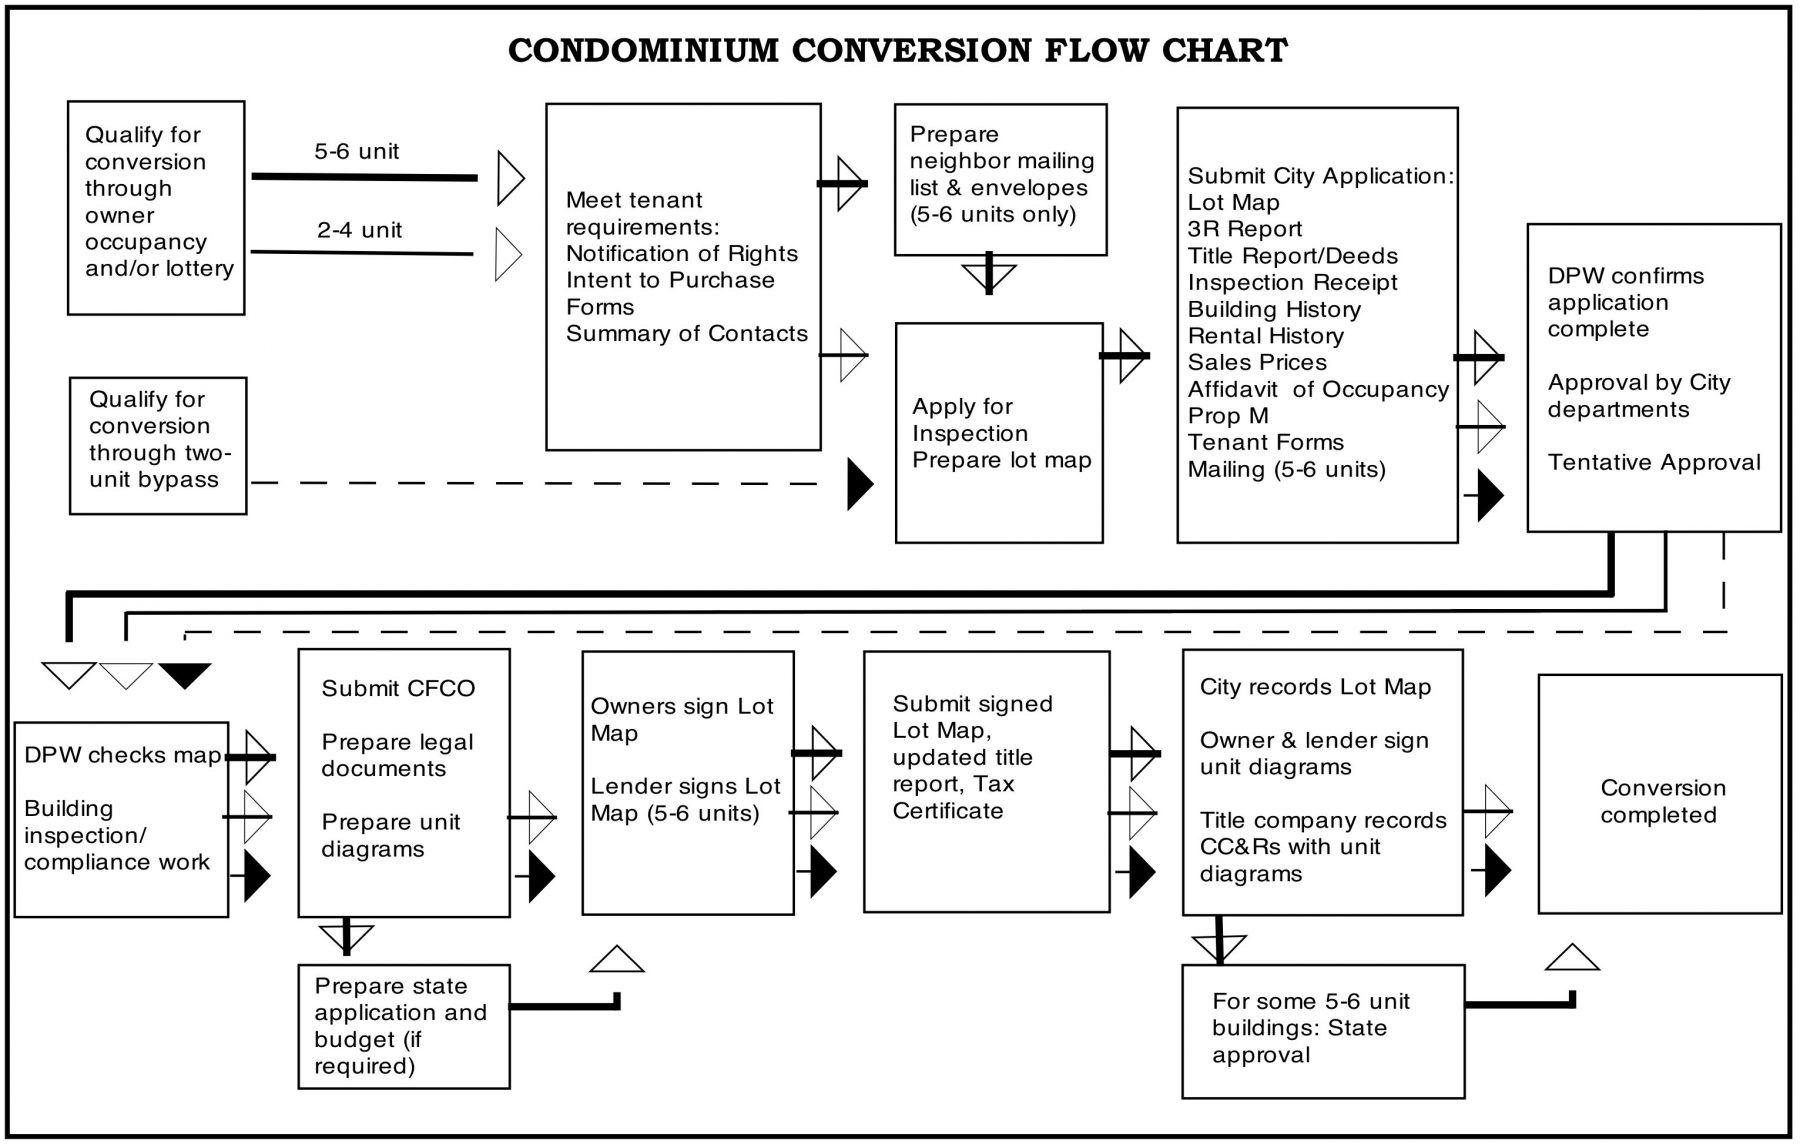 San Francisco Condominium Conversion Eligibility And Process